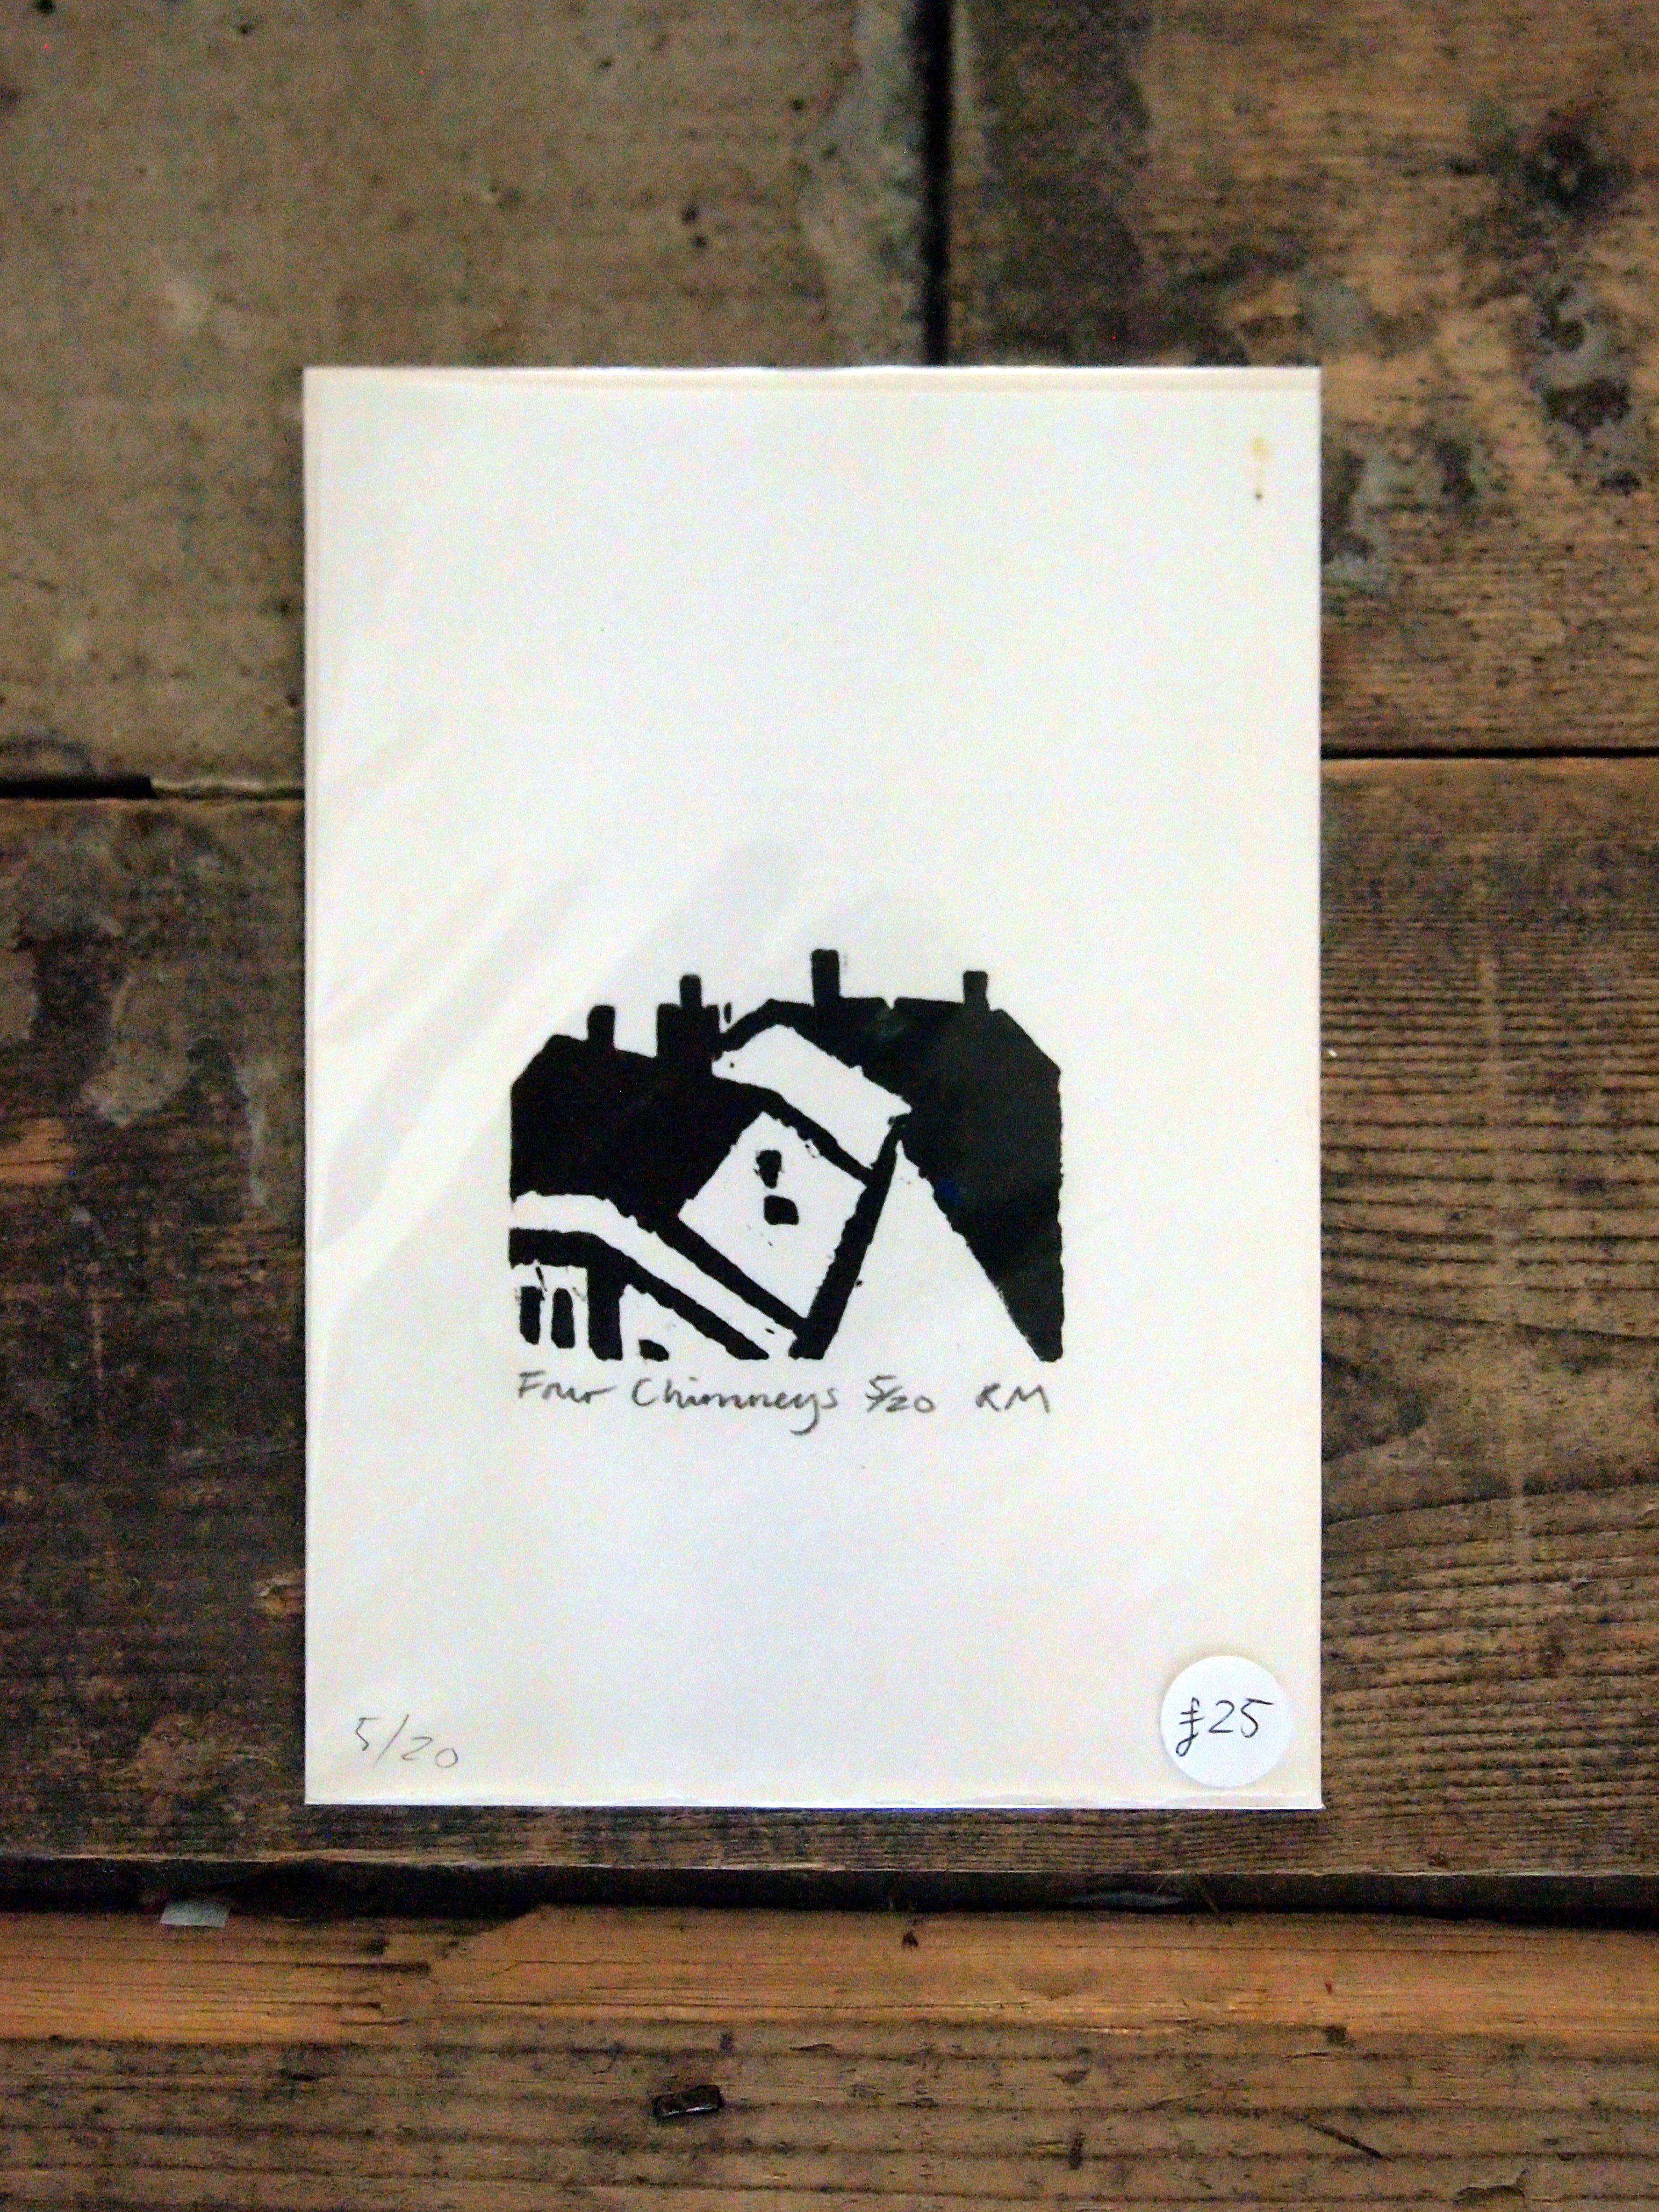 Four Chimneys - RE McGaul